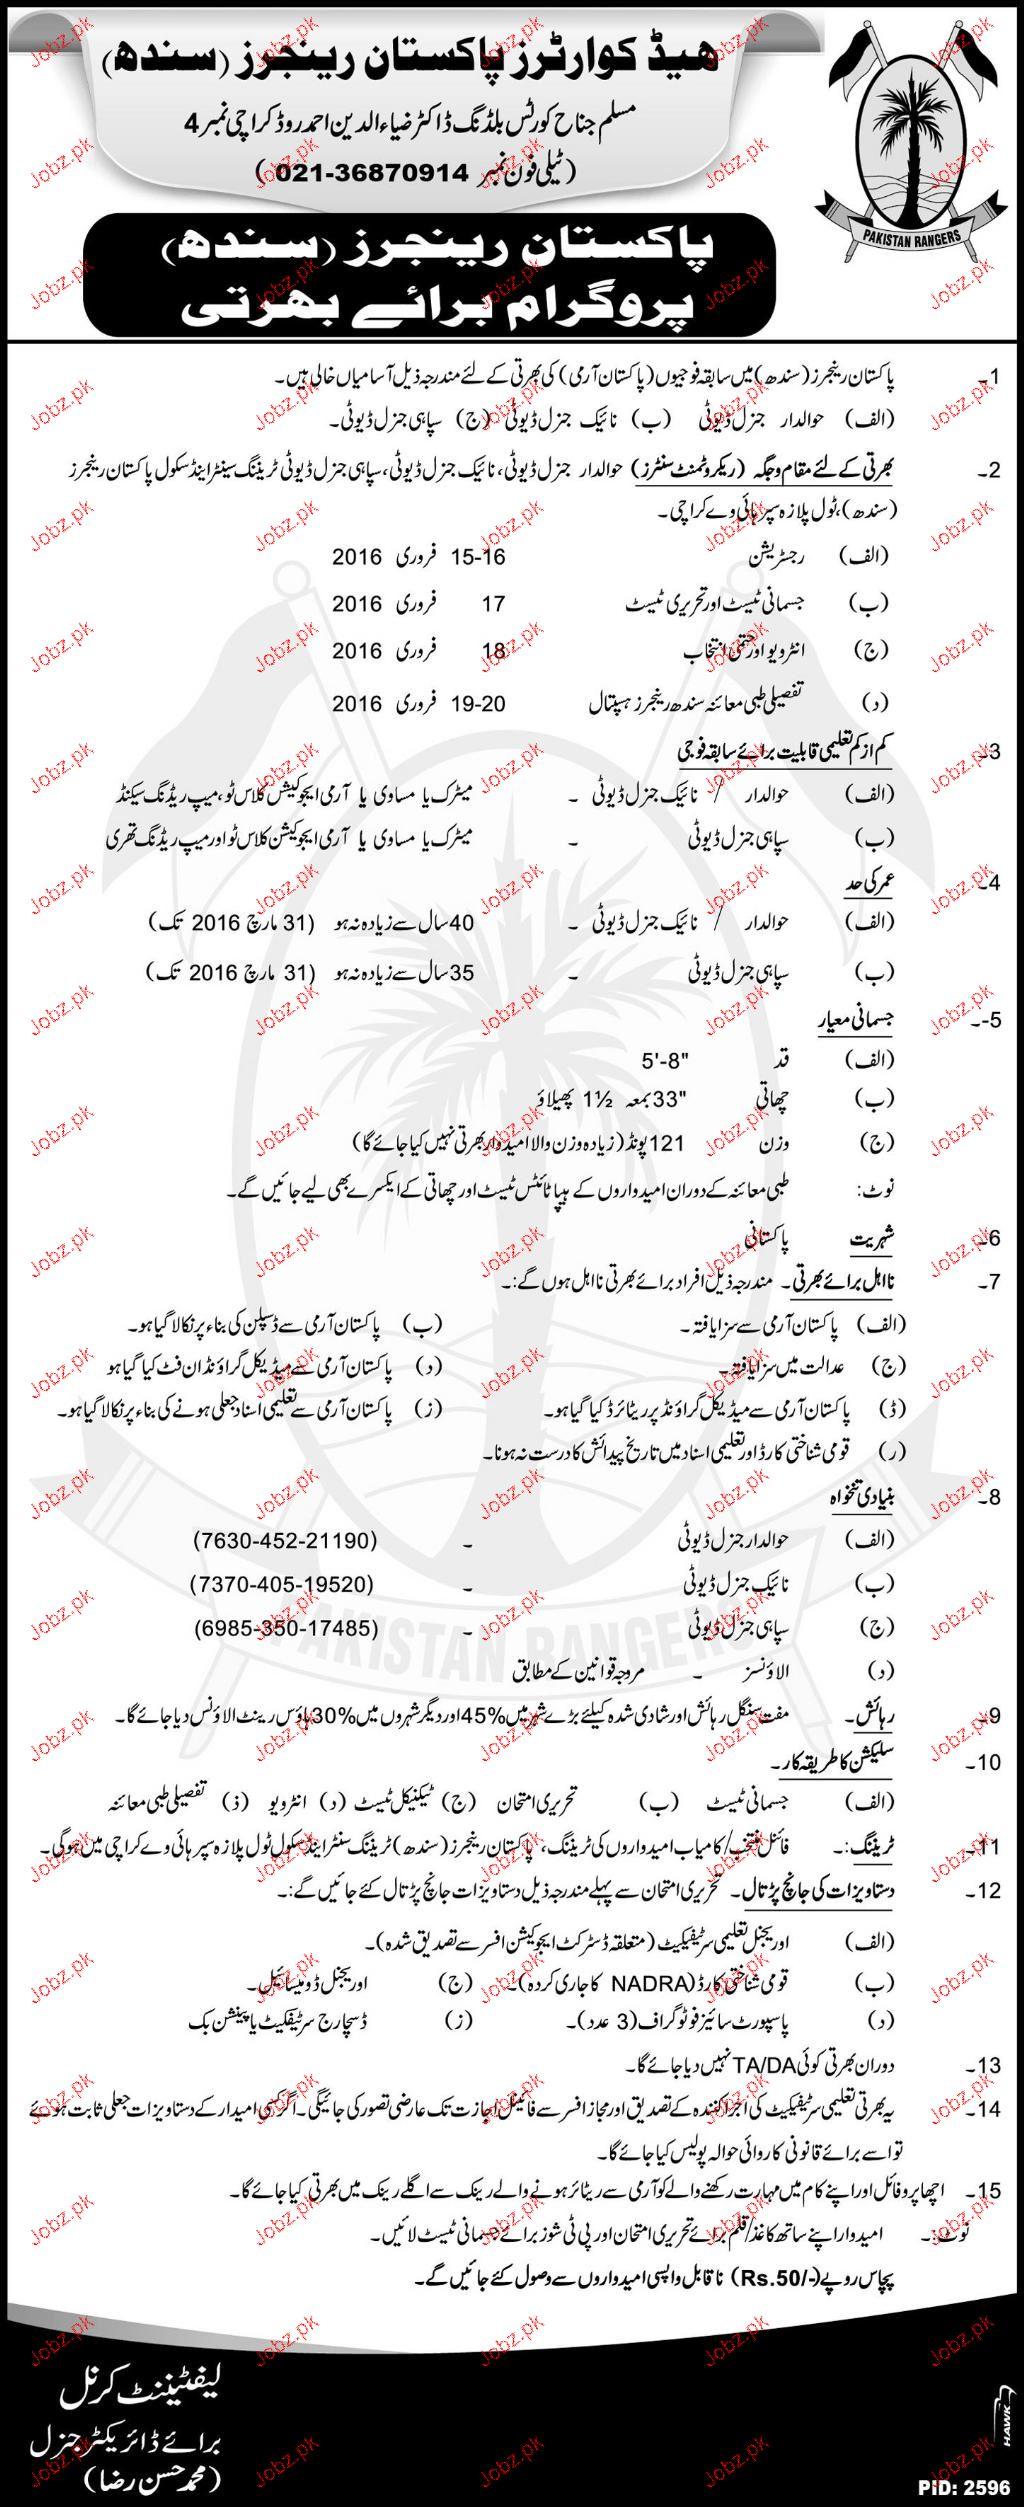 general recruitment in pakistan rangers 2019 job